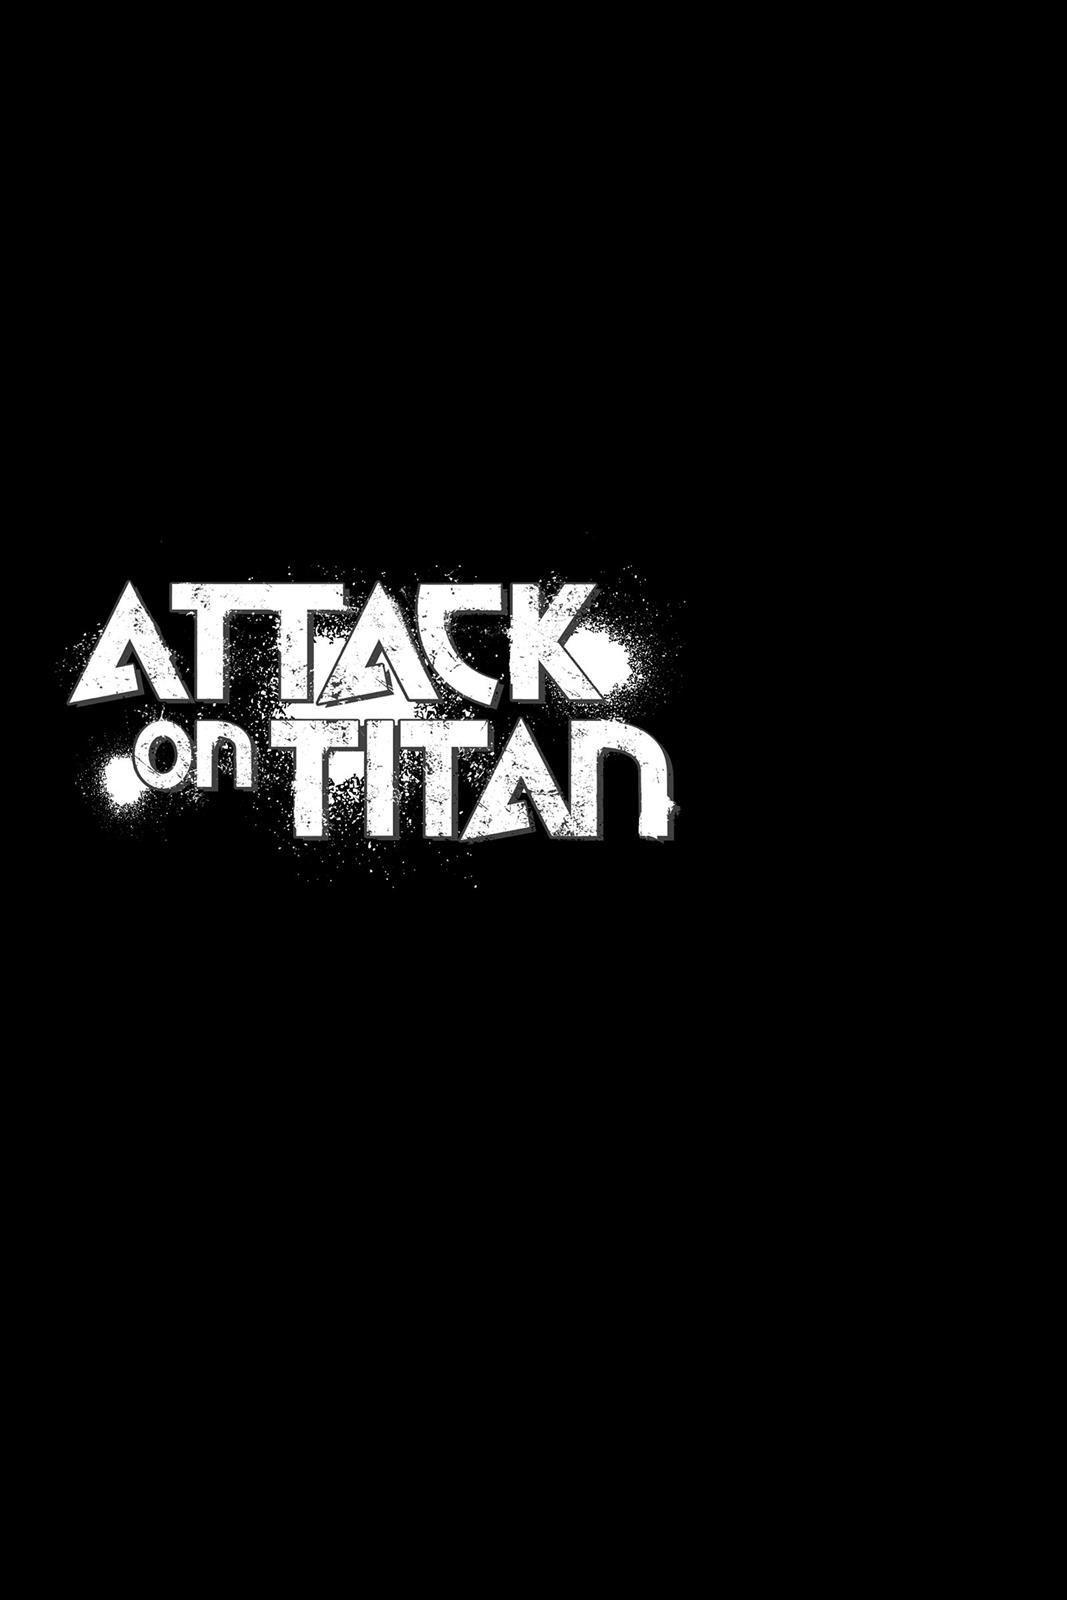 Attack On Titan, Episode 88 image 046